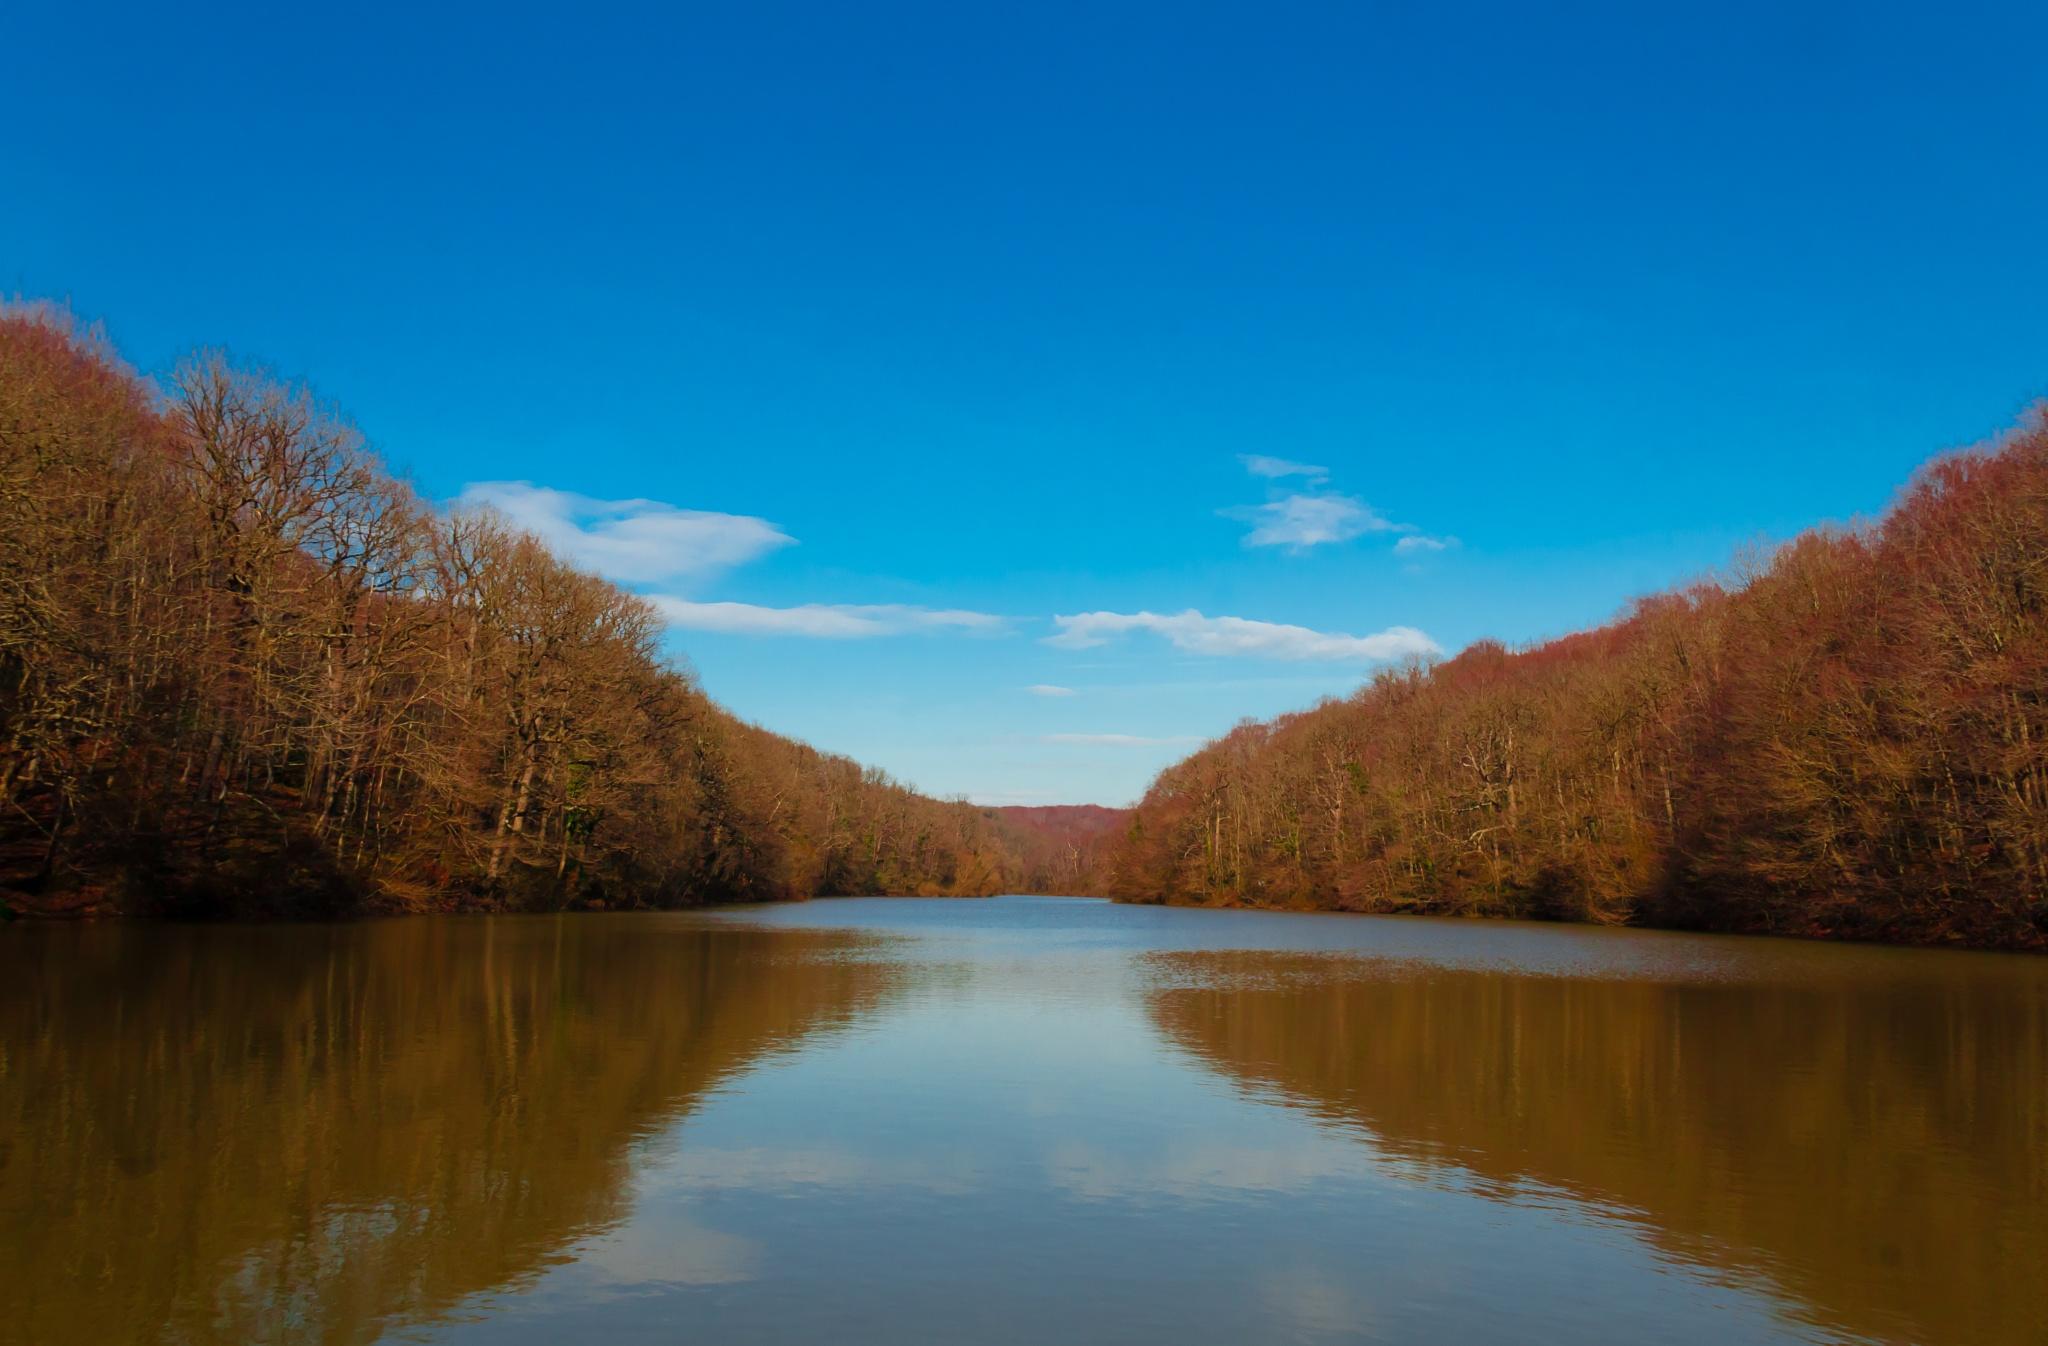 Valide Sultan Lake by Ali aldourzy